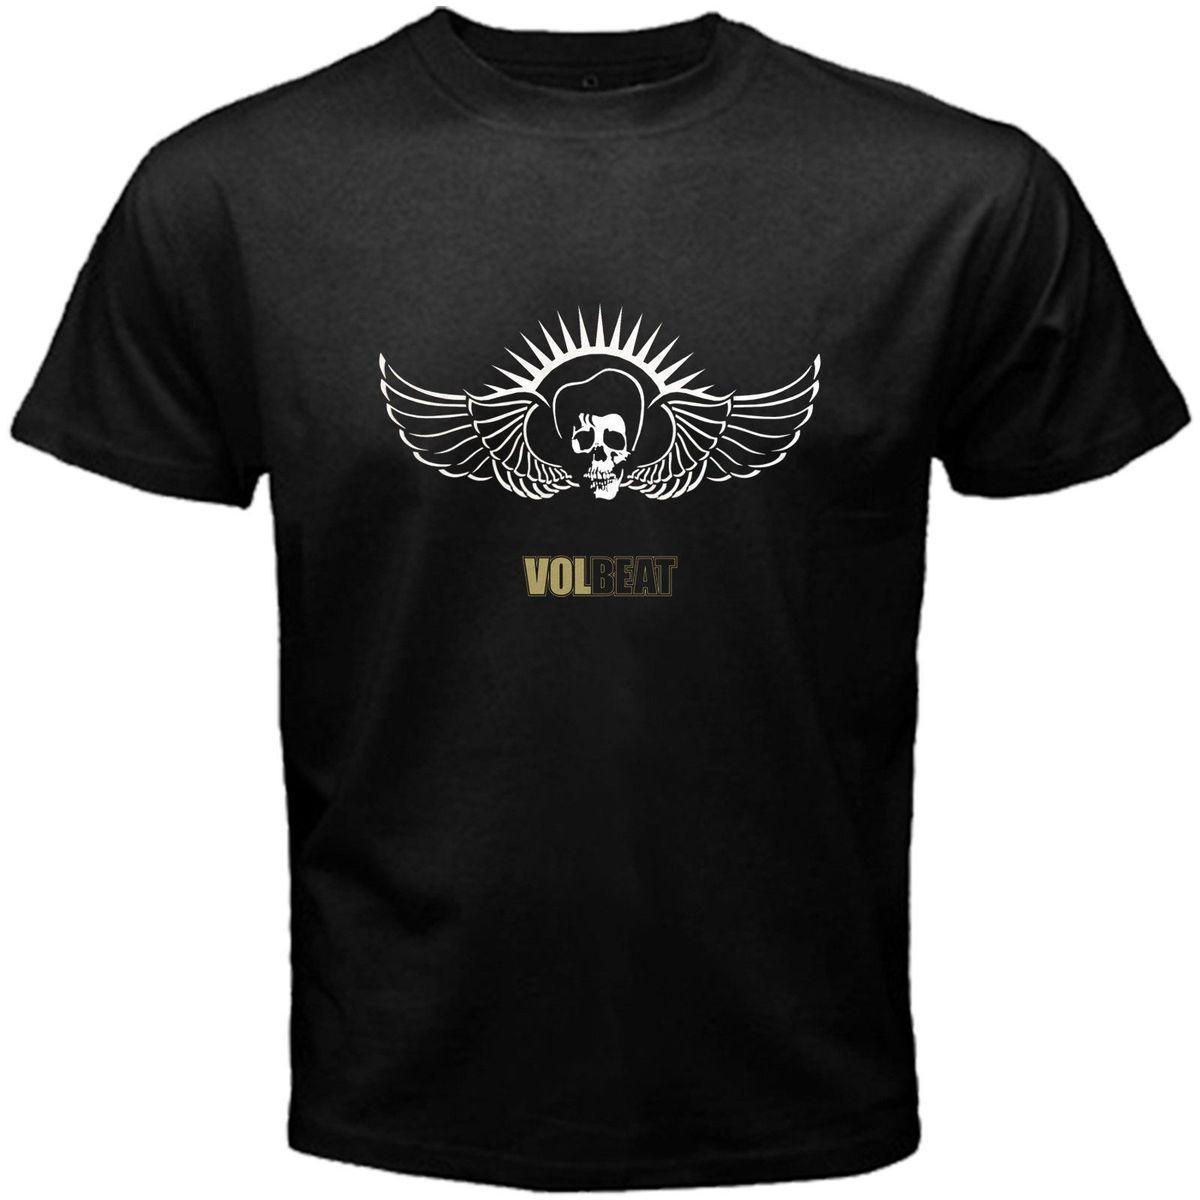 Volbeat Tour LOGO Lady Black T-shirt Woman Rock Band Shirt